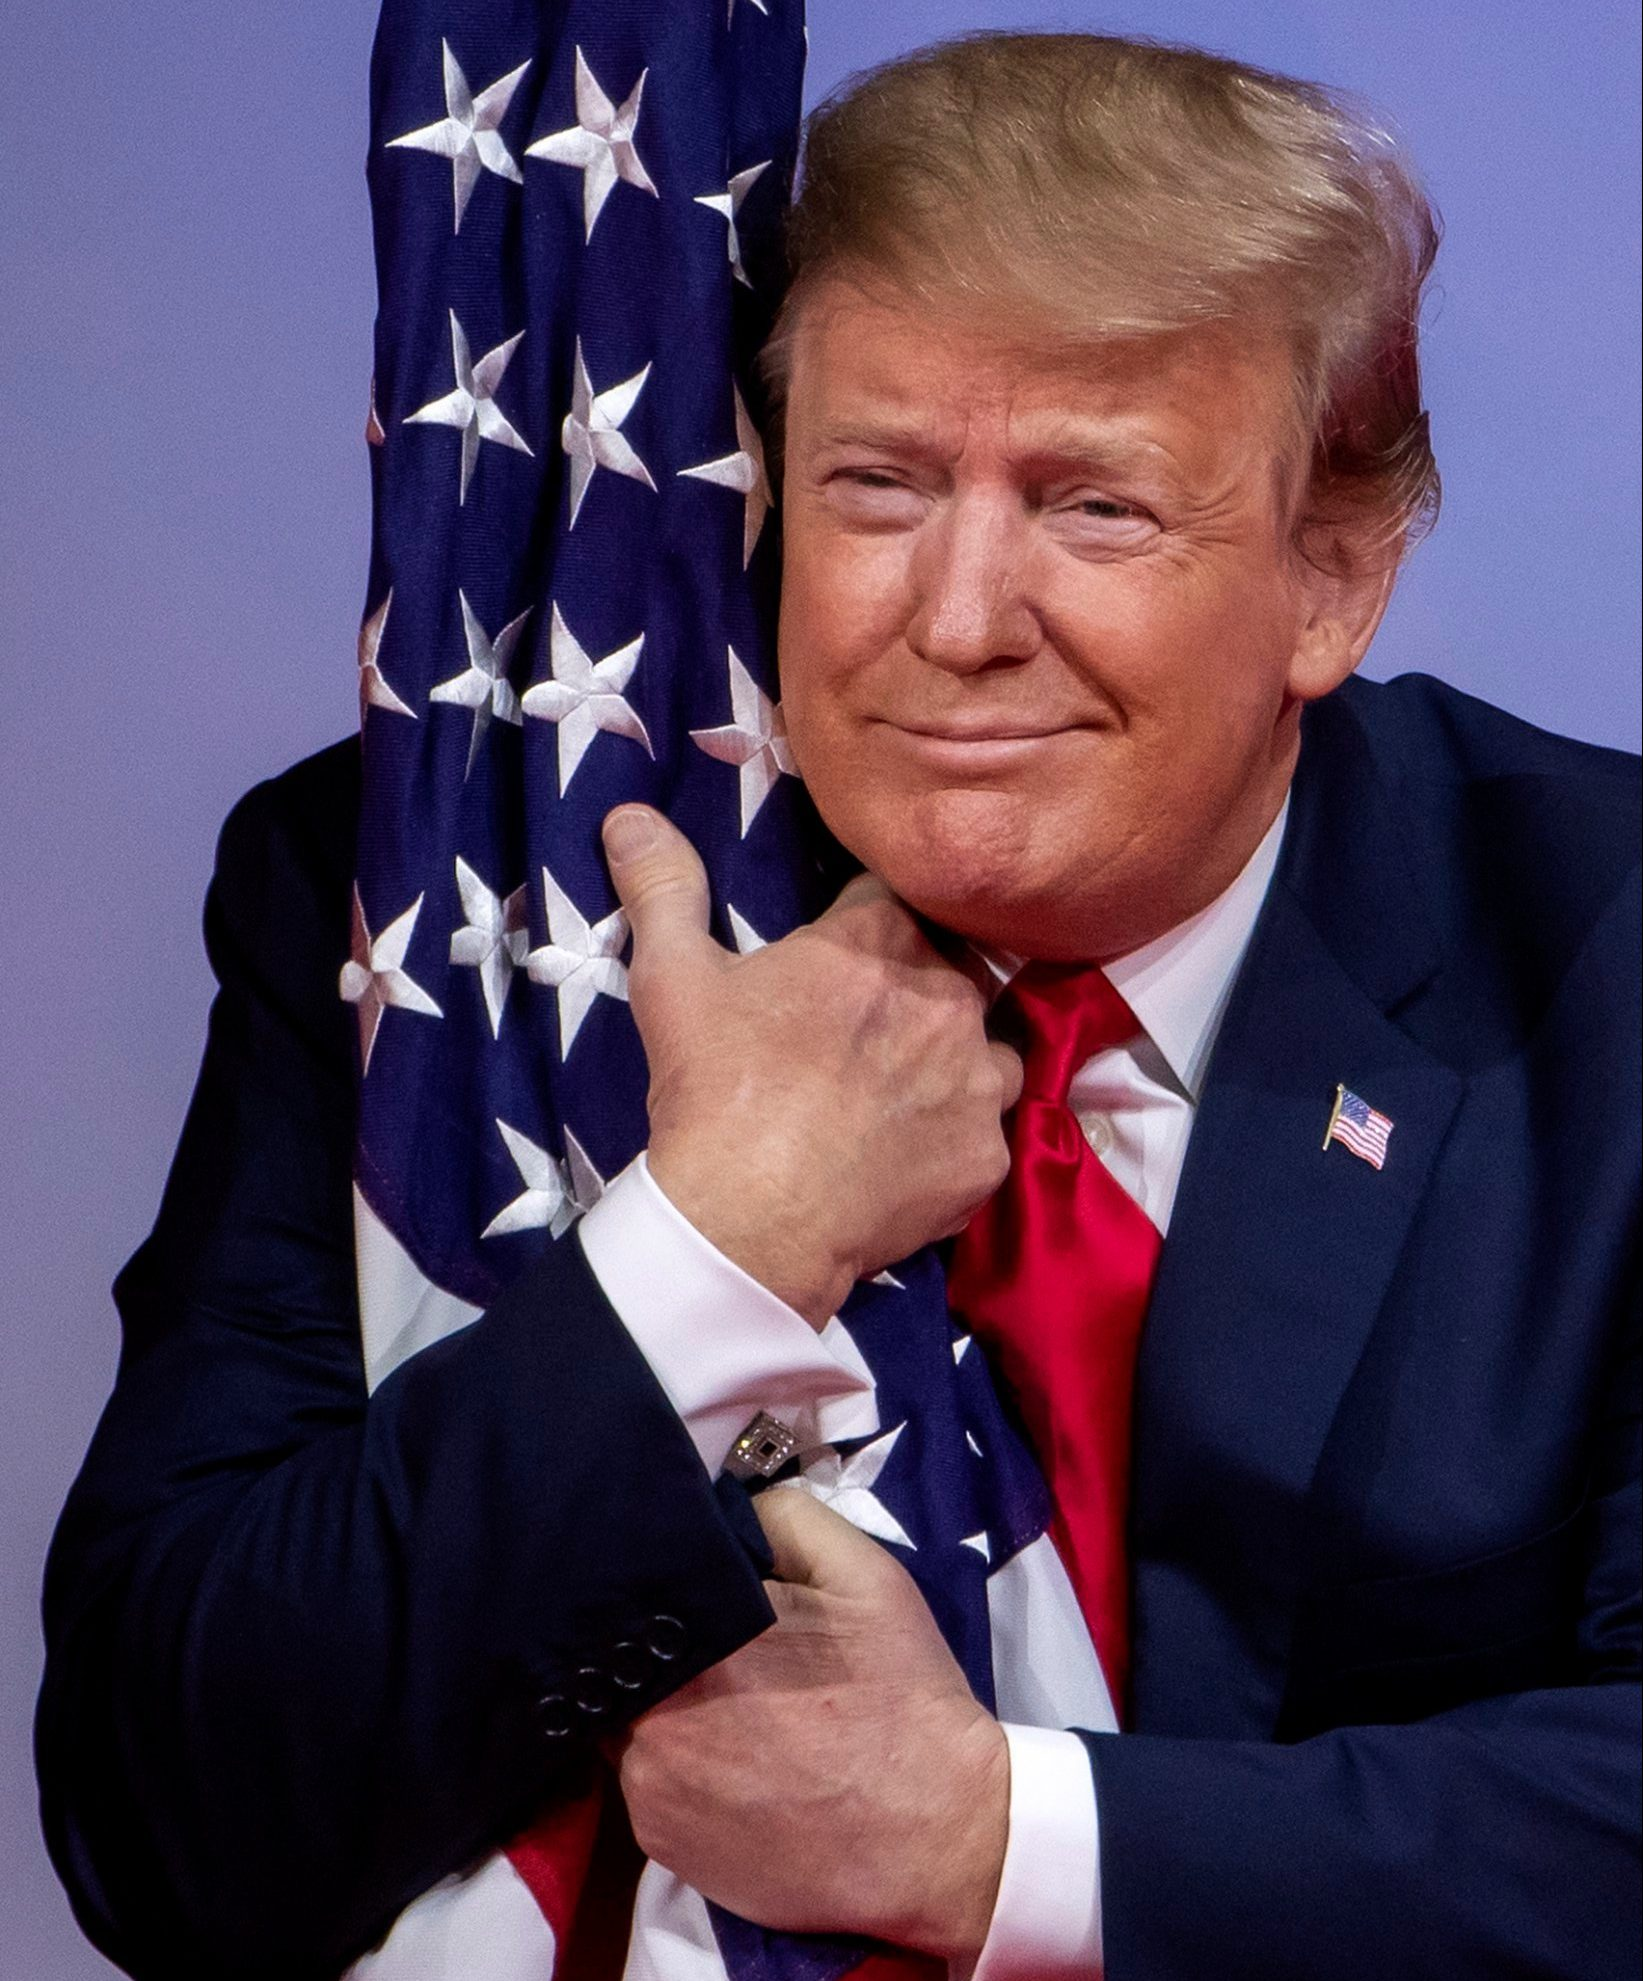 Congress announces new investigation into Donald Trump, his campaign, and businesses